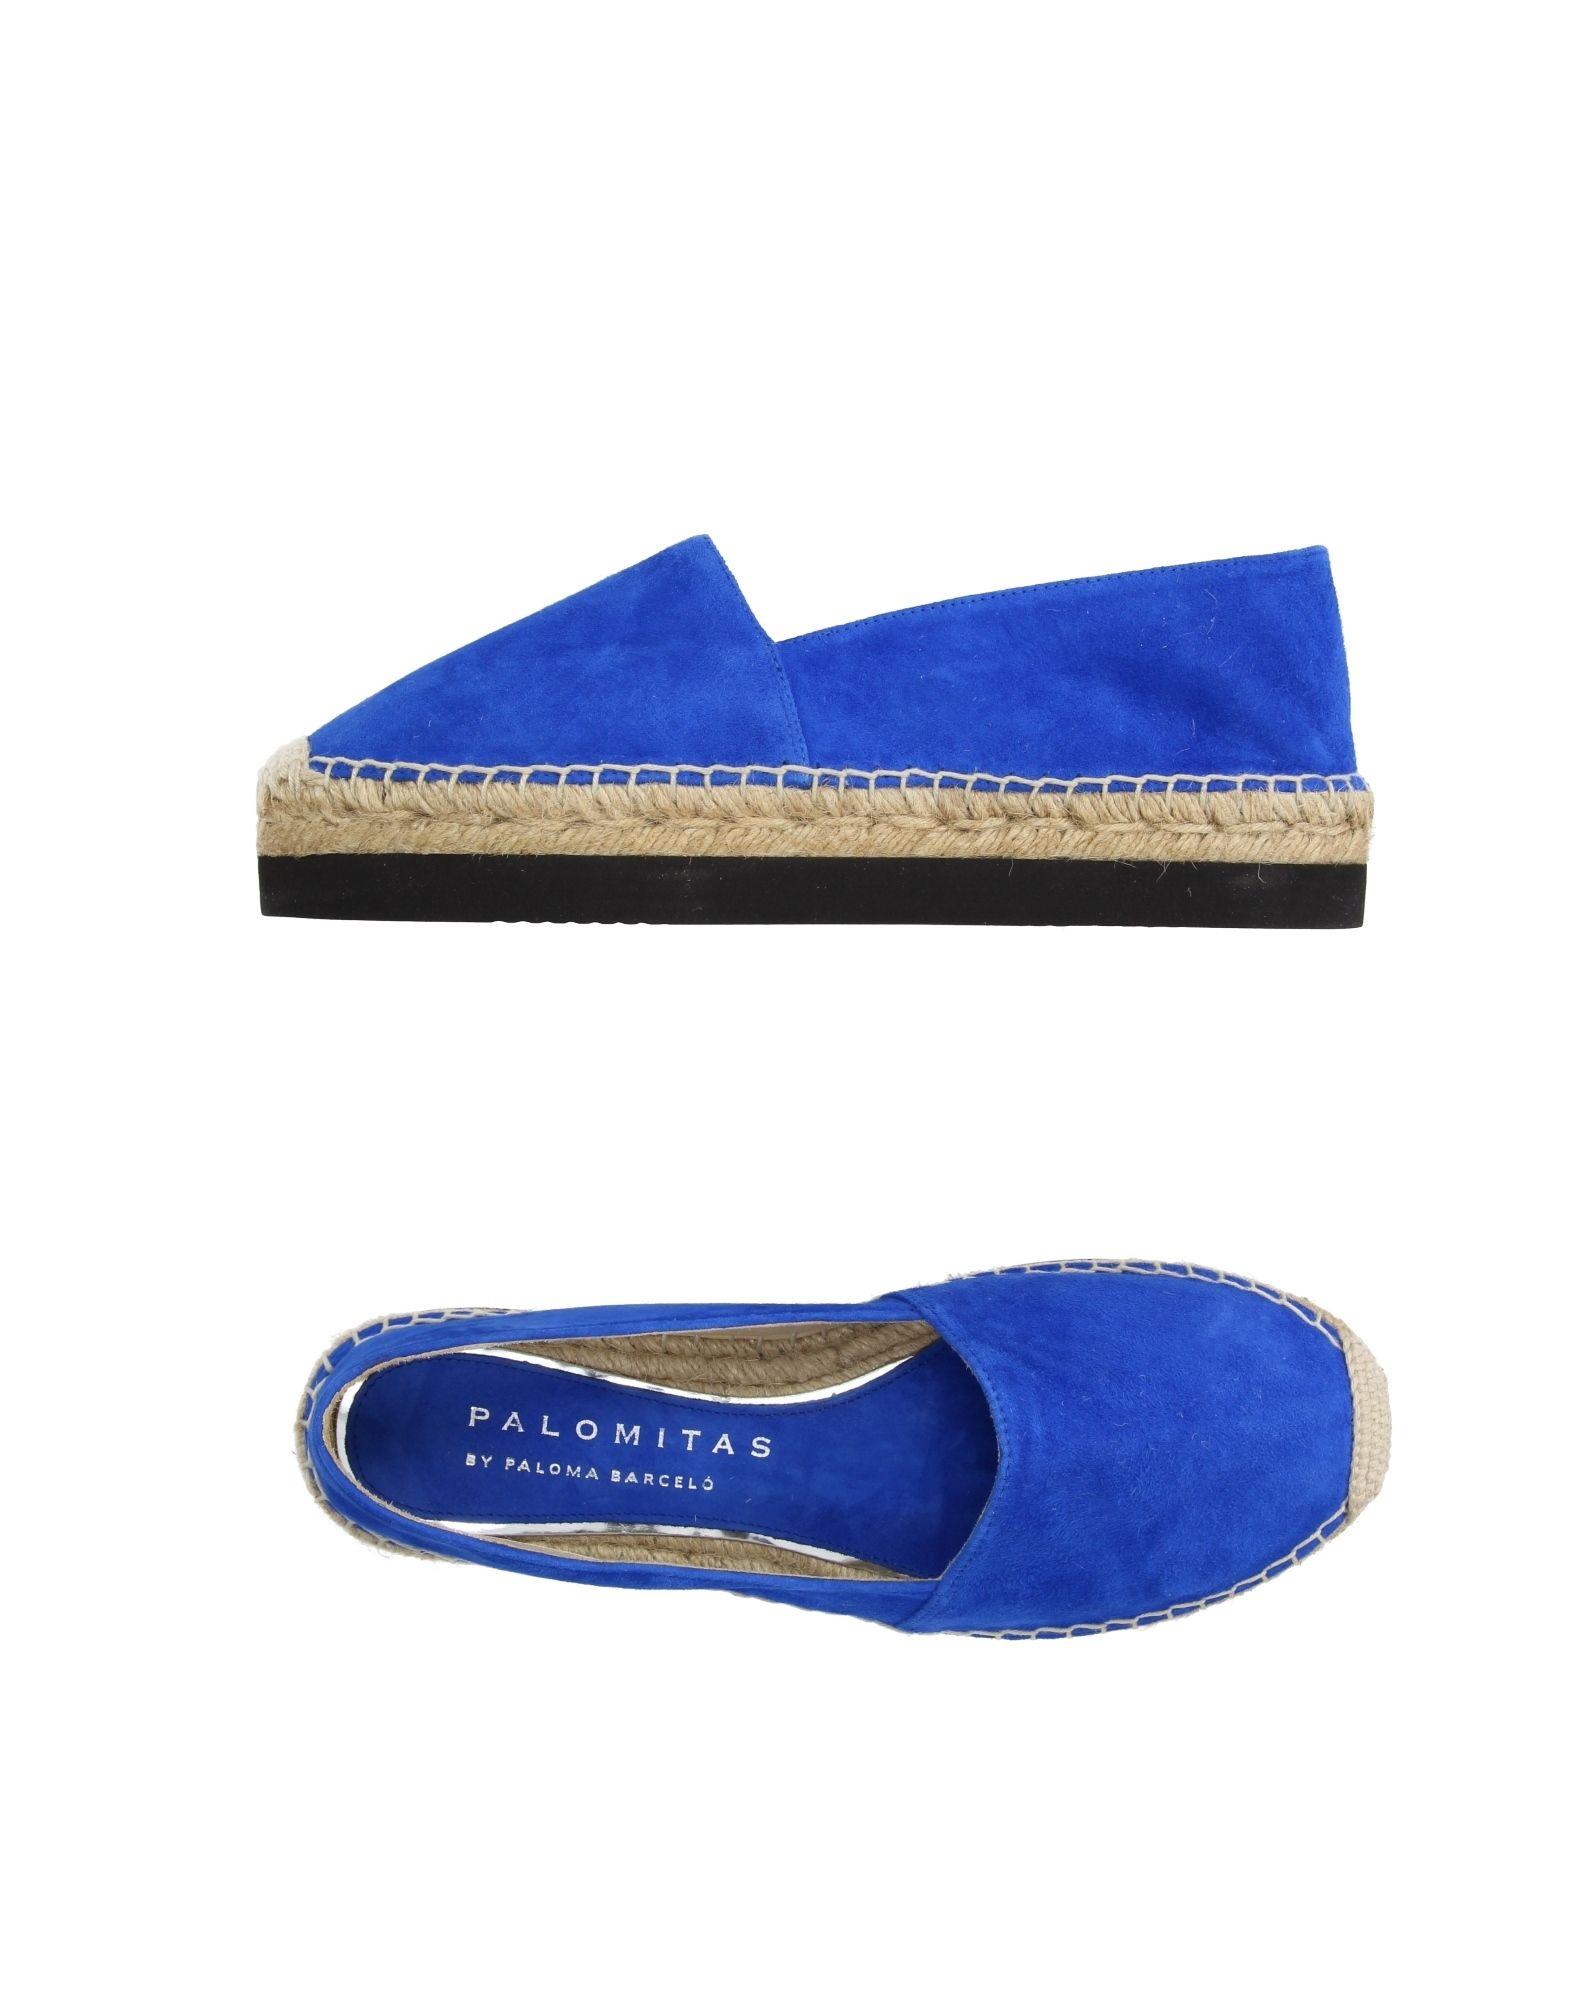 Palomitas By Paloma Barceló Espadrilles Damen  11151447WW Gute Qualität beliebte Schuhe